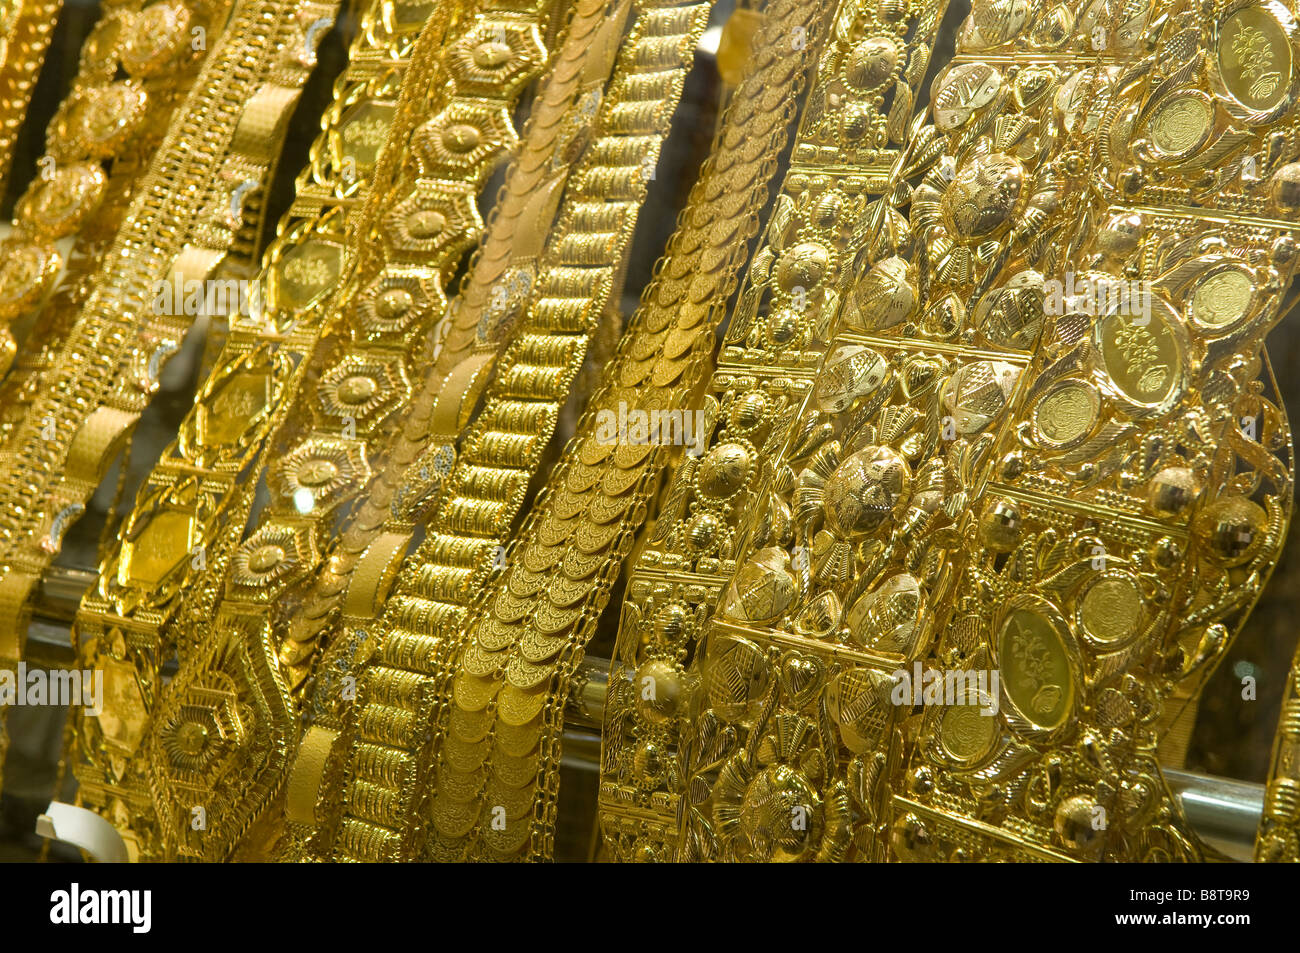 necklace display in gold souk shop window, dubai, uae - Stock Image